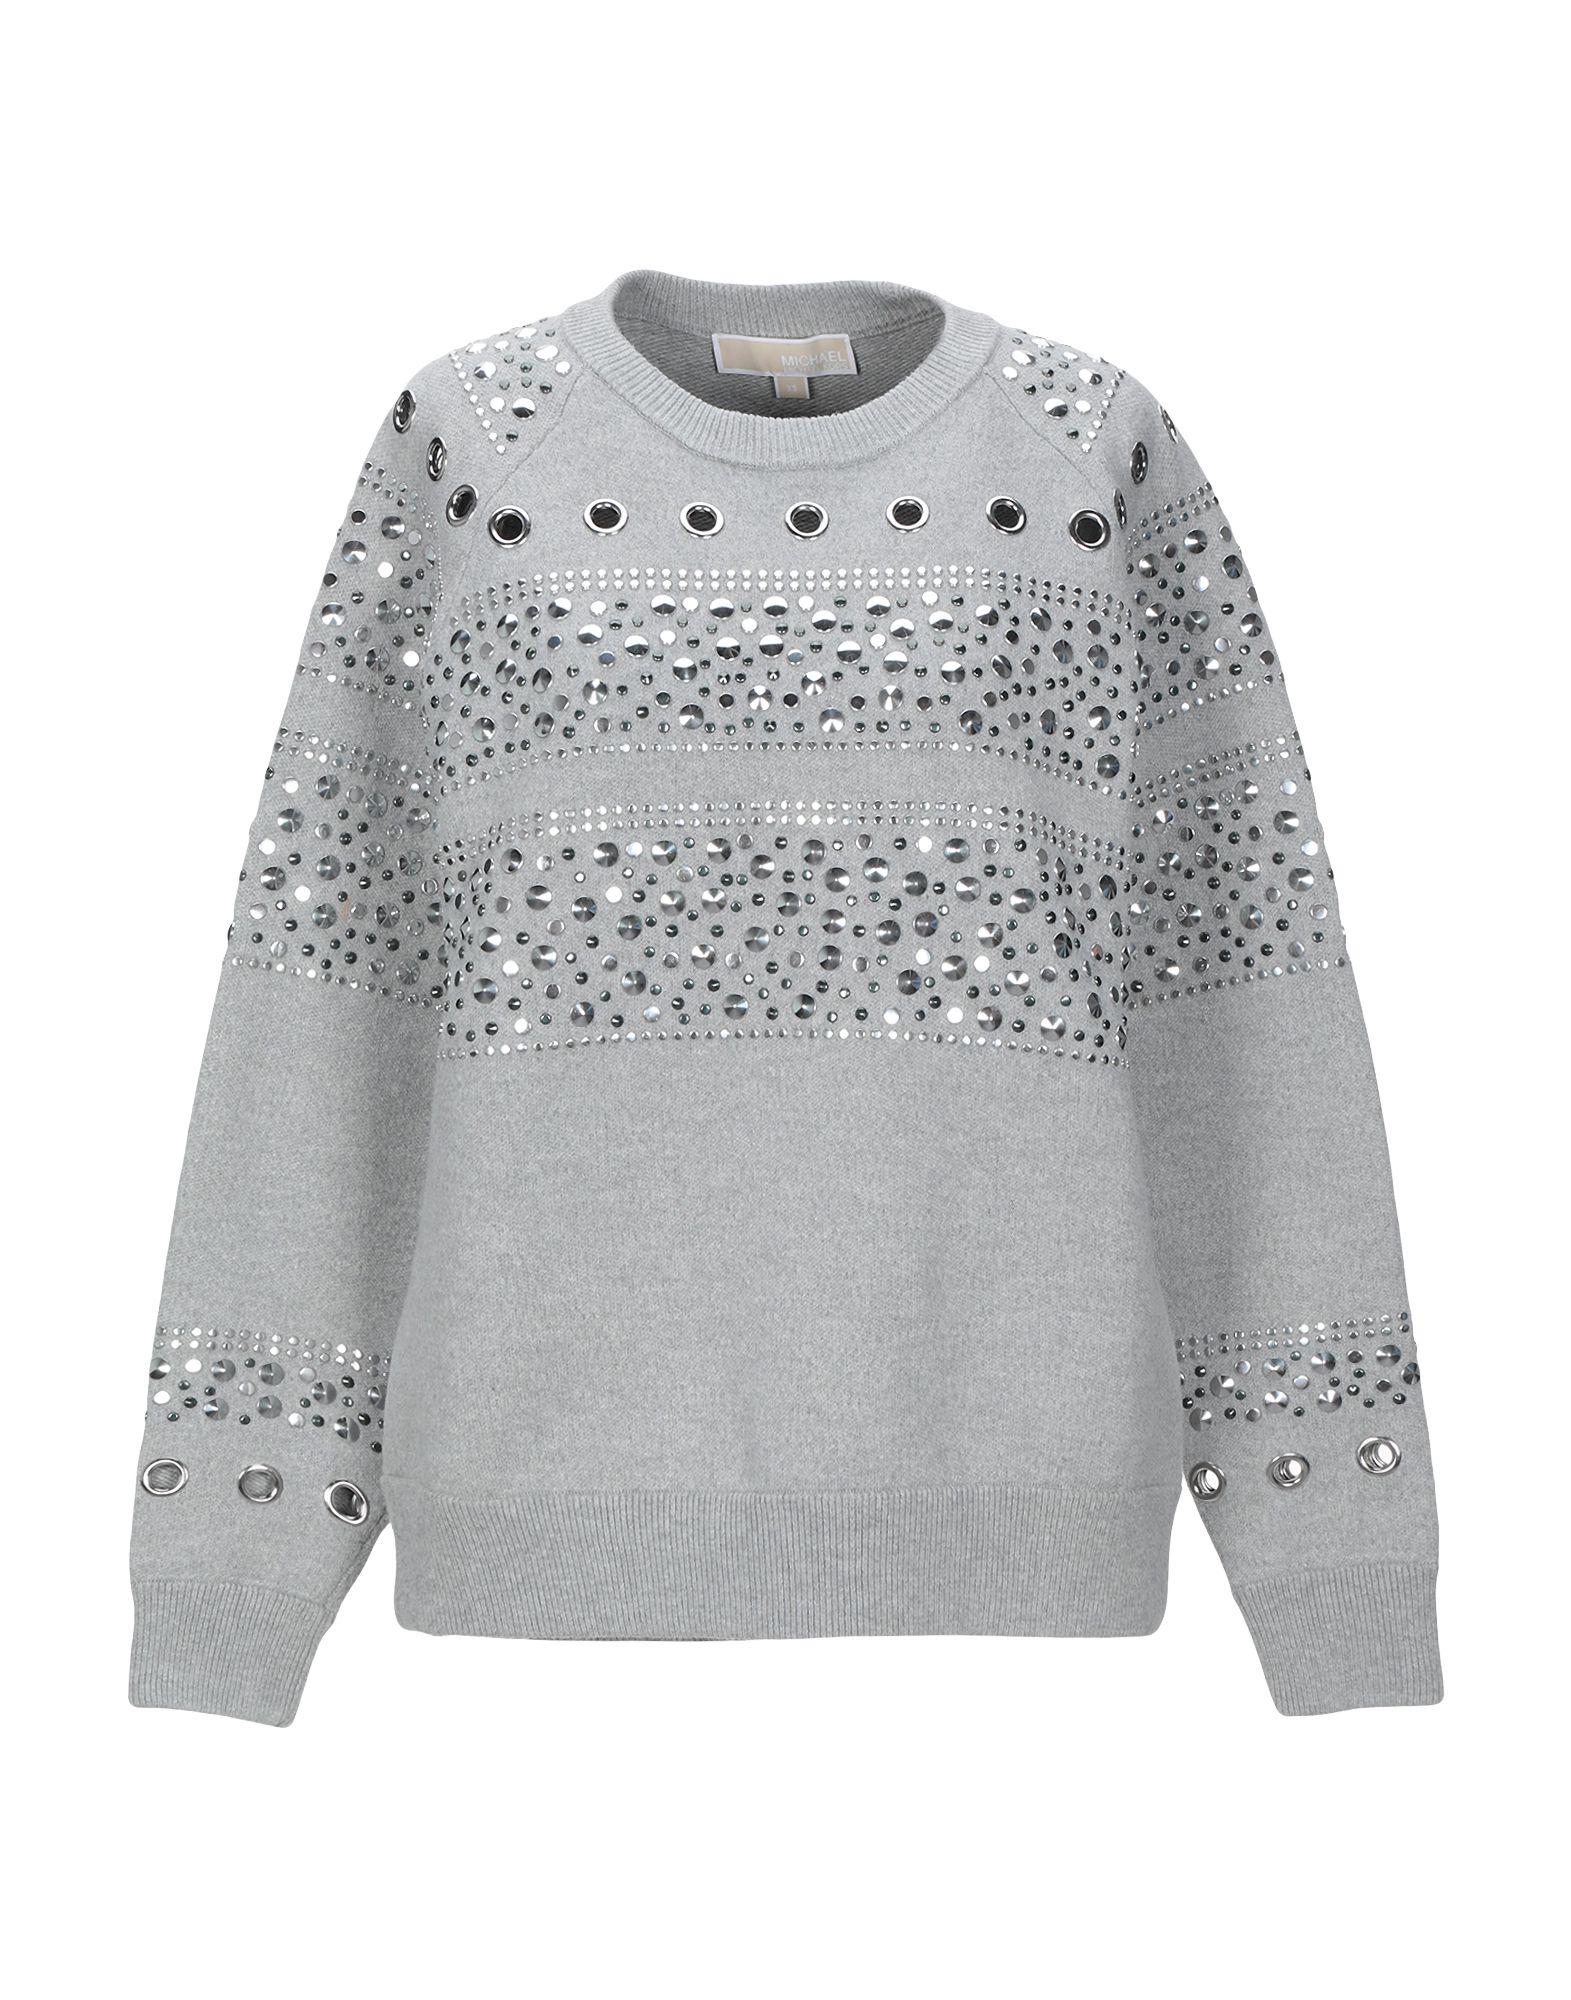 MICHAEL MICHAEL KORS Sweaters - Item 39956260